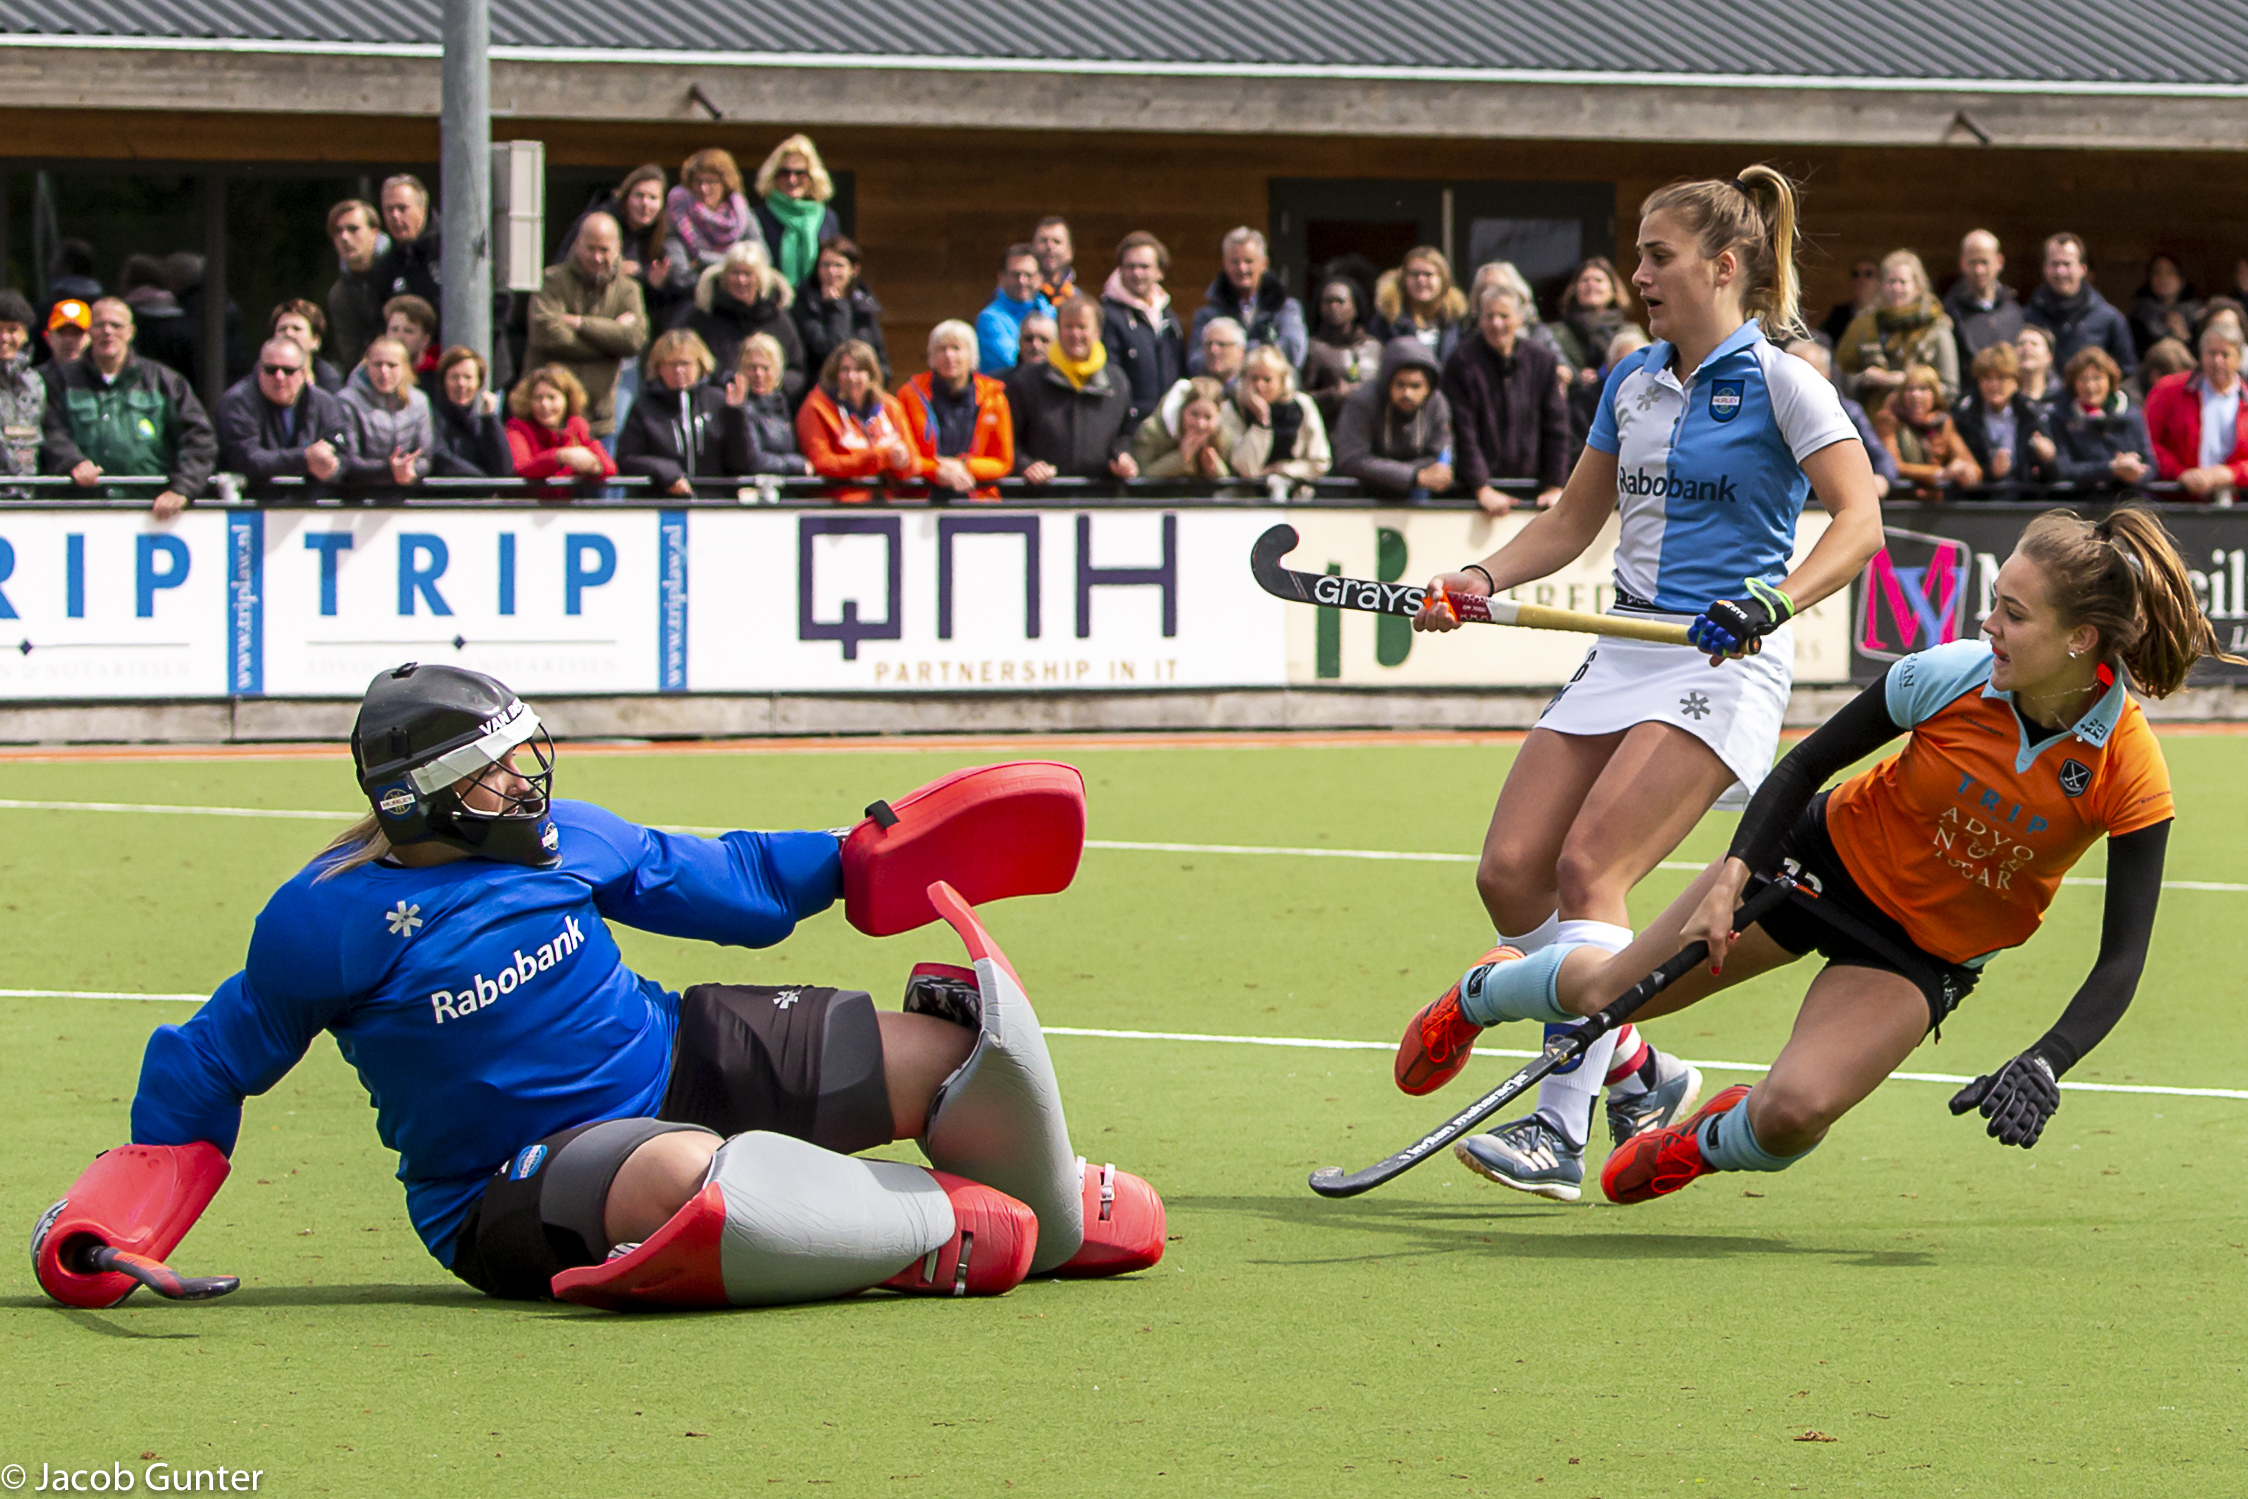 Round-up Livera Hoofdklasse (D): Den Bosch en Amsterdam winnen ruim, Gooise derby prooi voor Laren